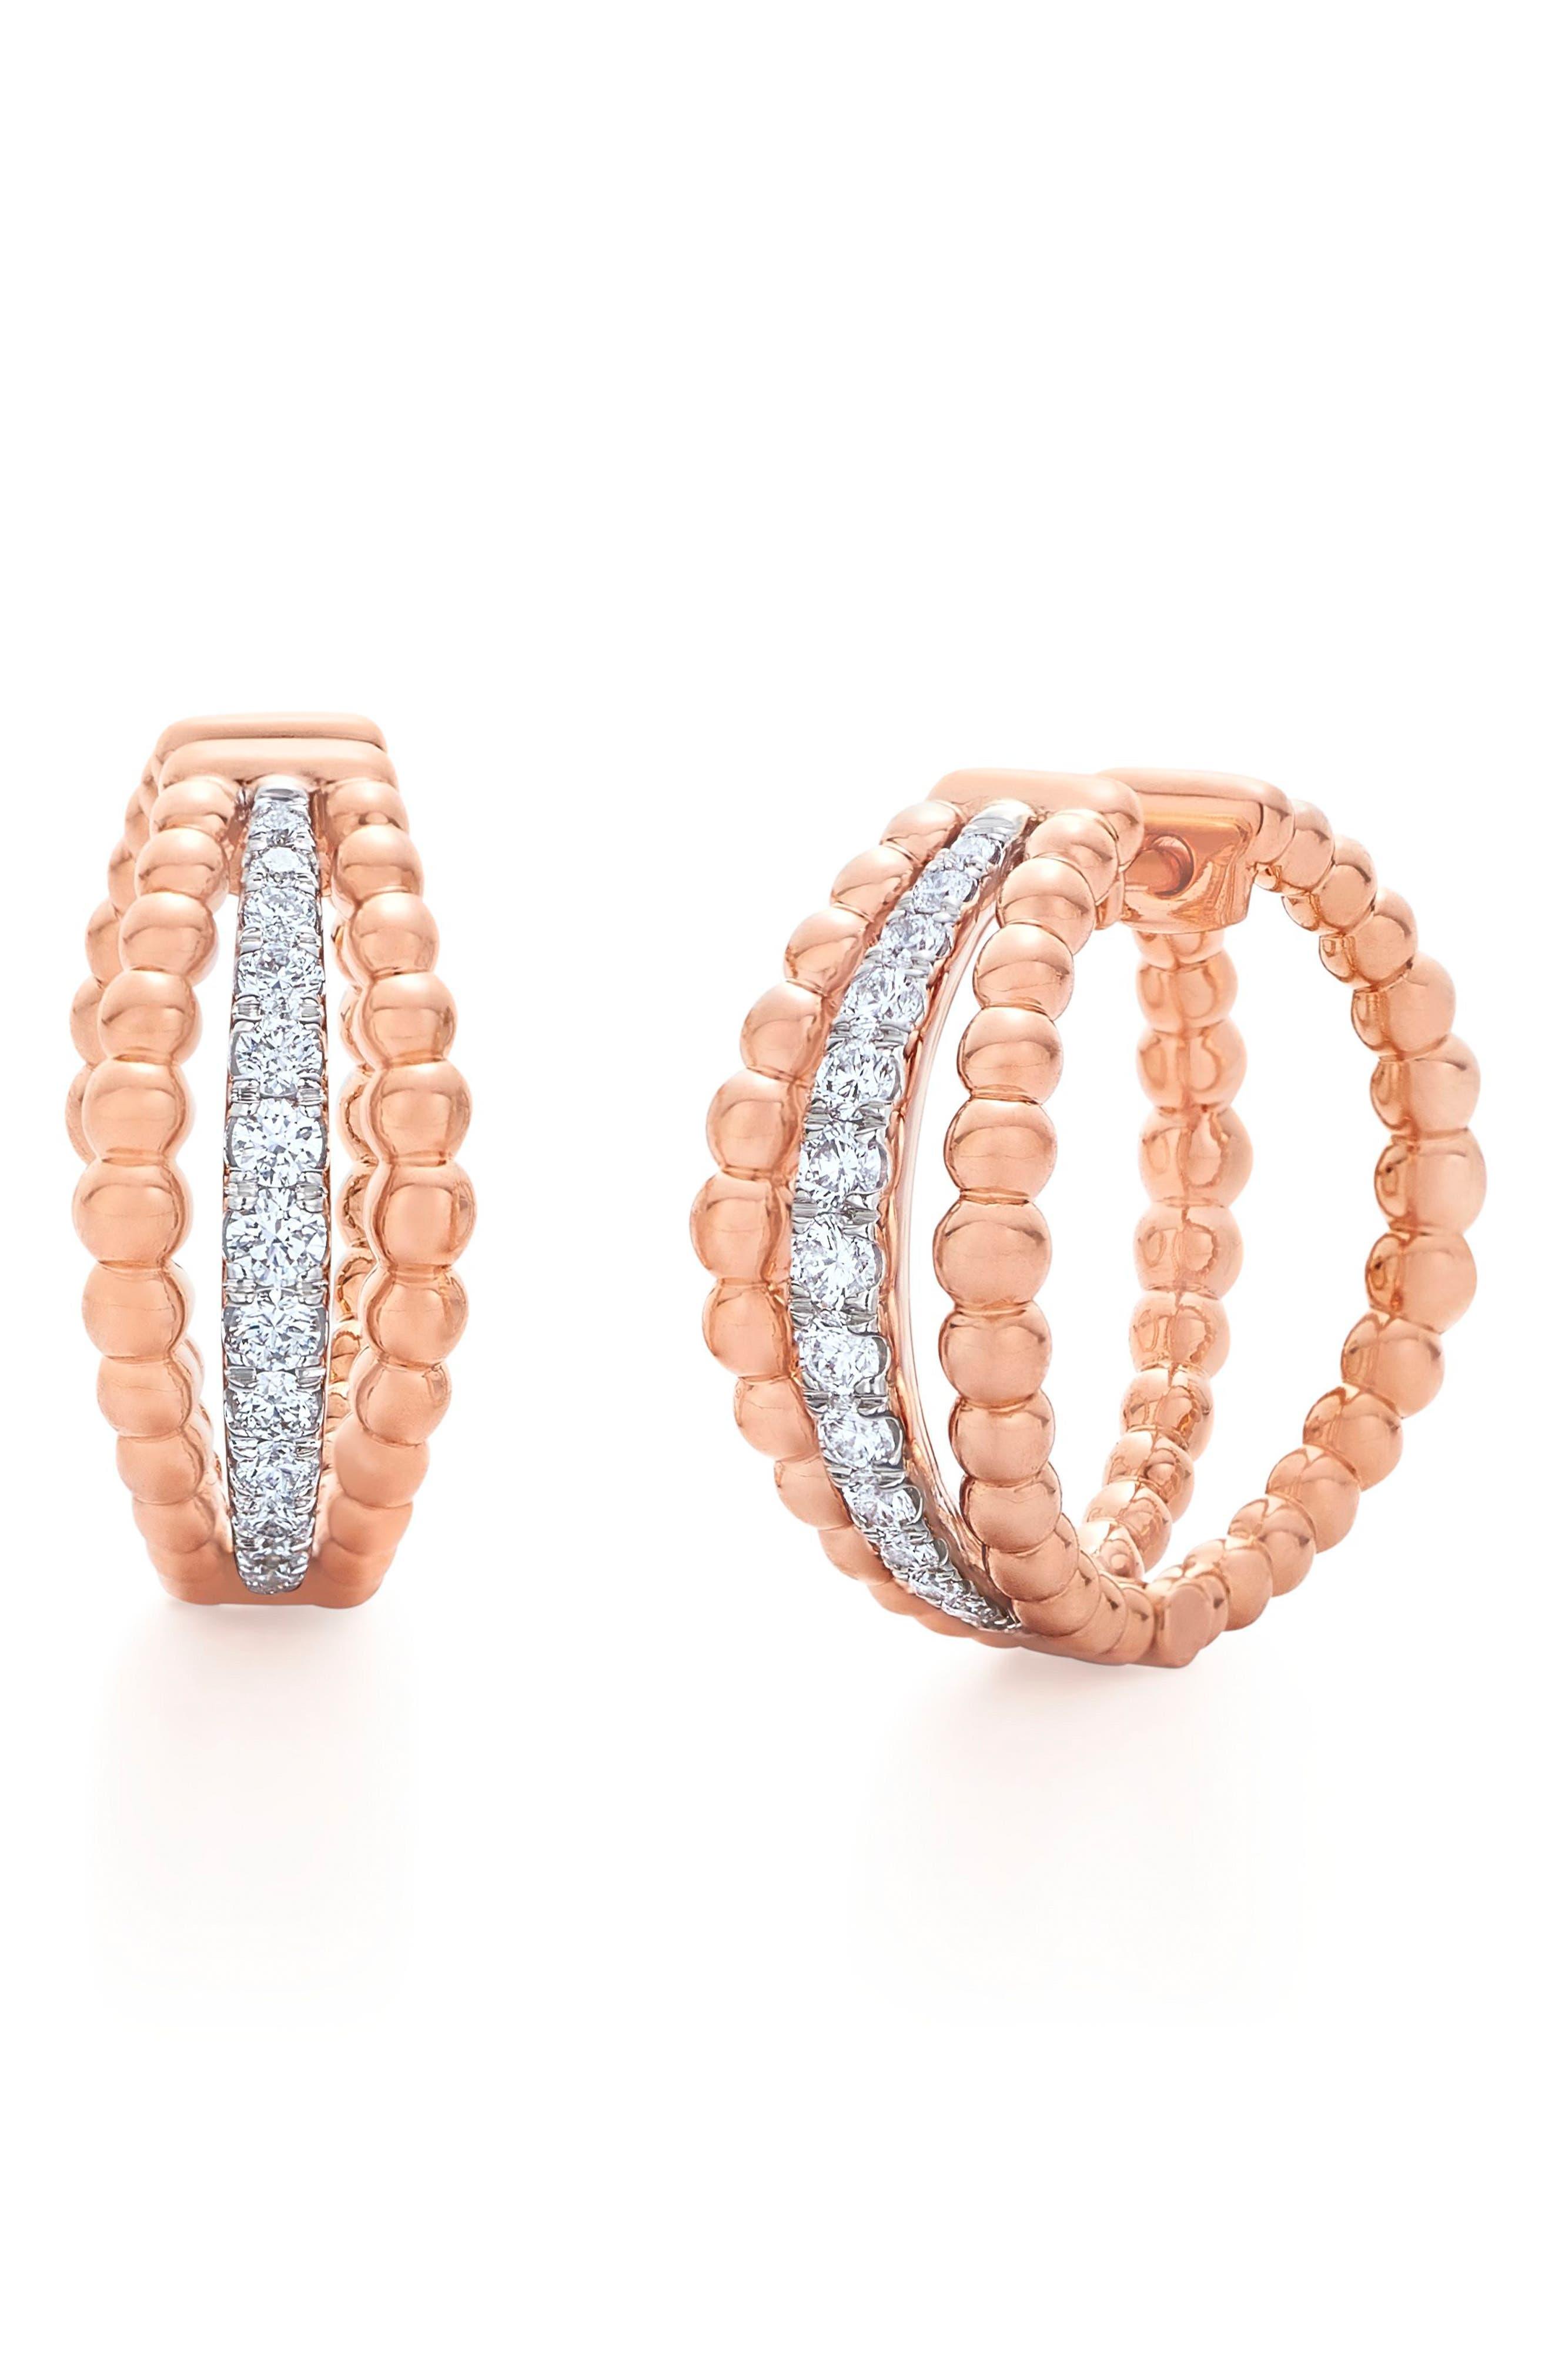 Main Image - Kwiat Beaded Multirow Diamond Hoop Earrings